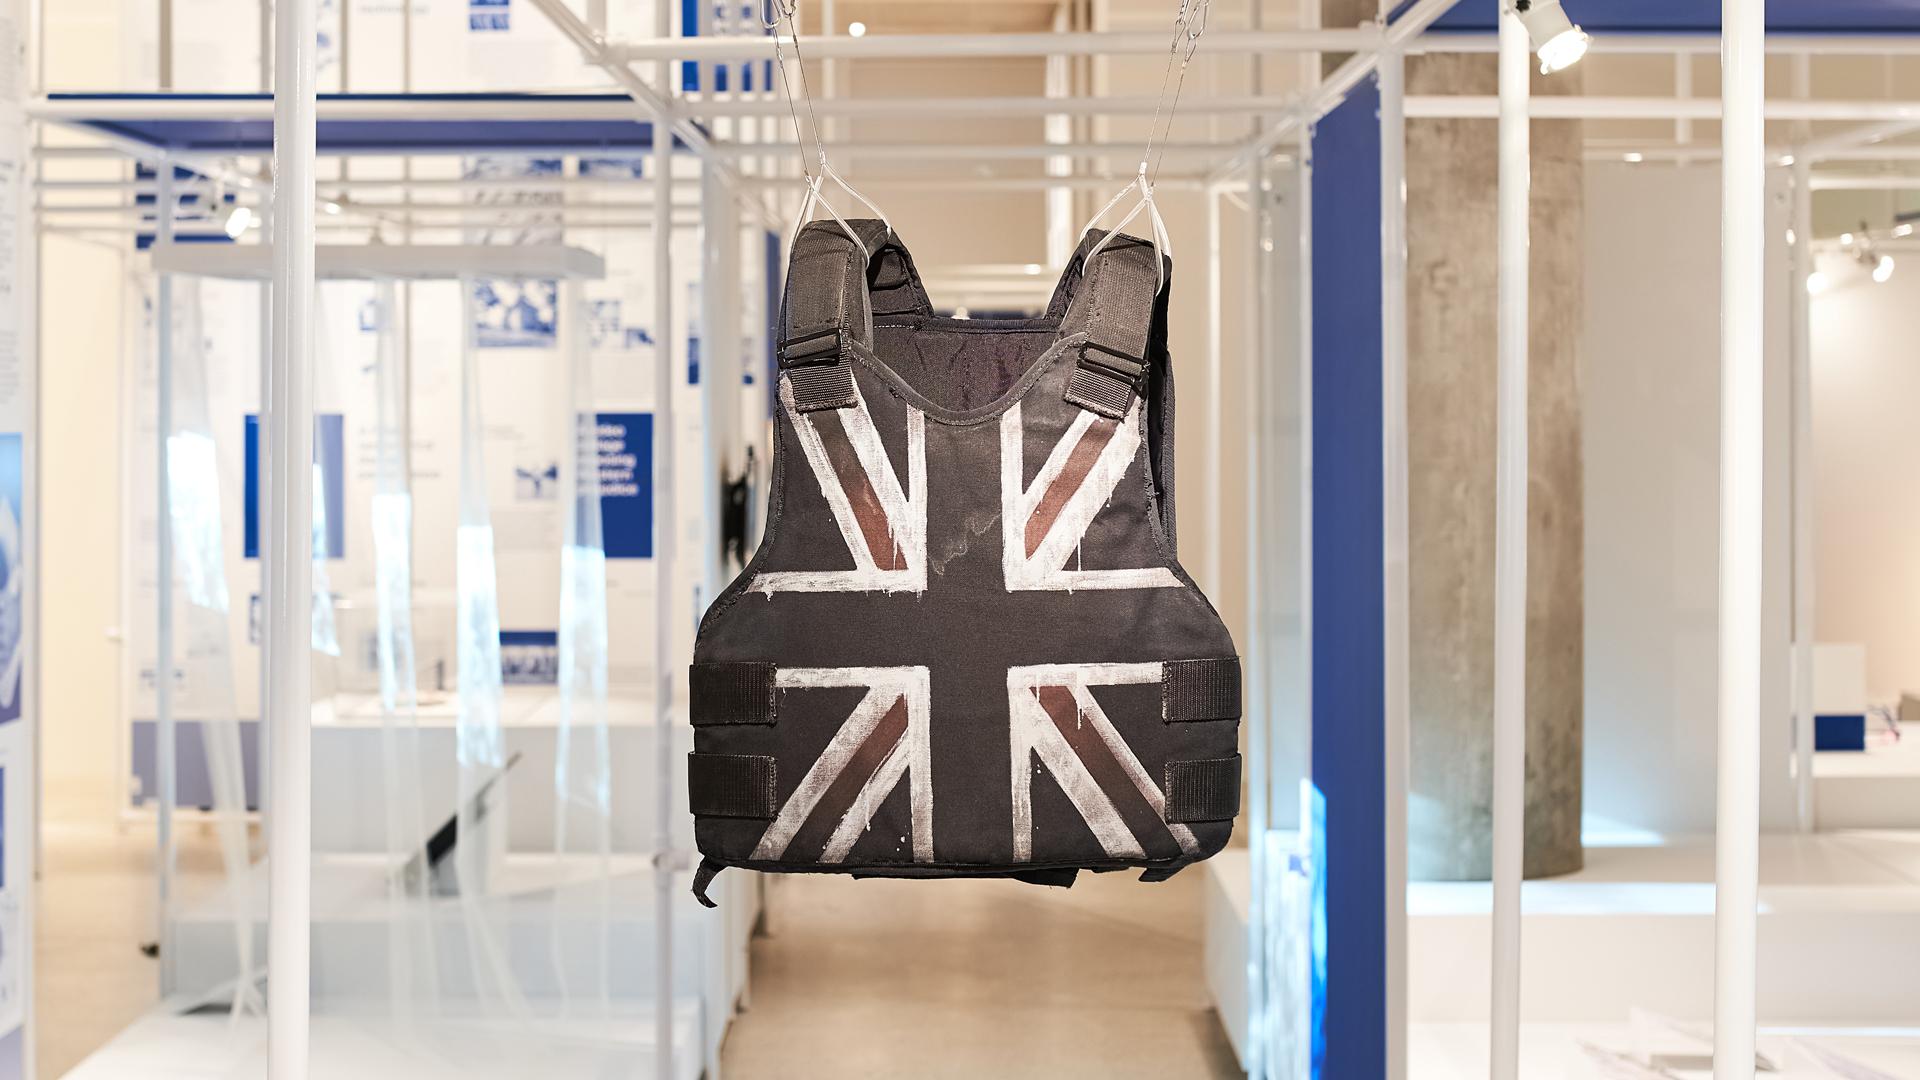 Beazley Designs of the Year showcases coronavirus responses and social tensions | Design Week